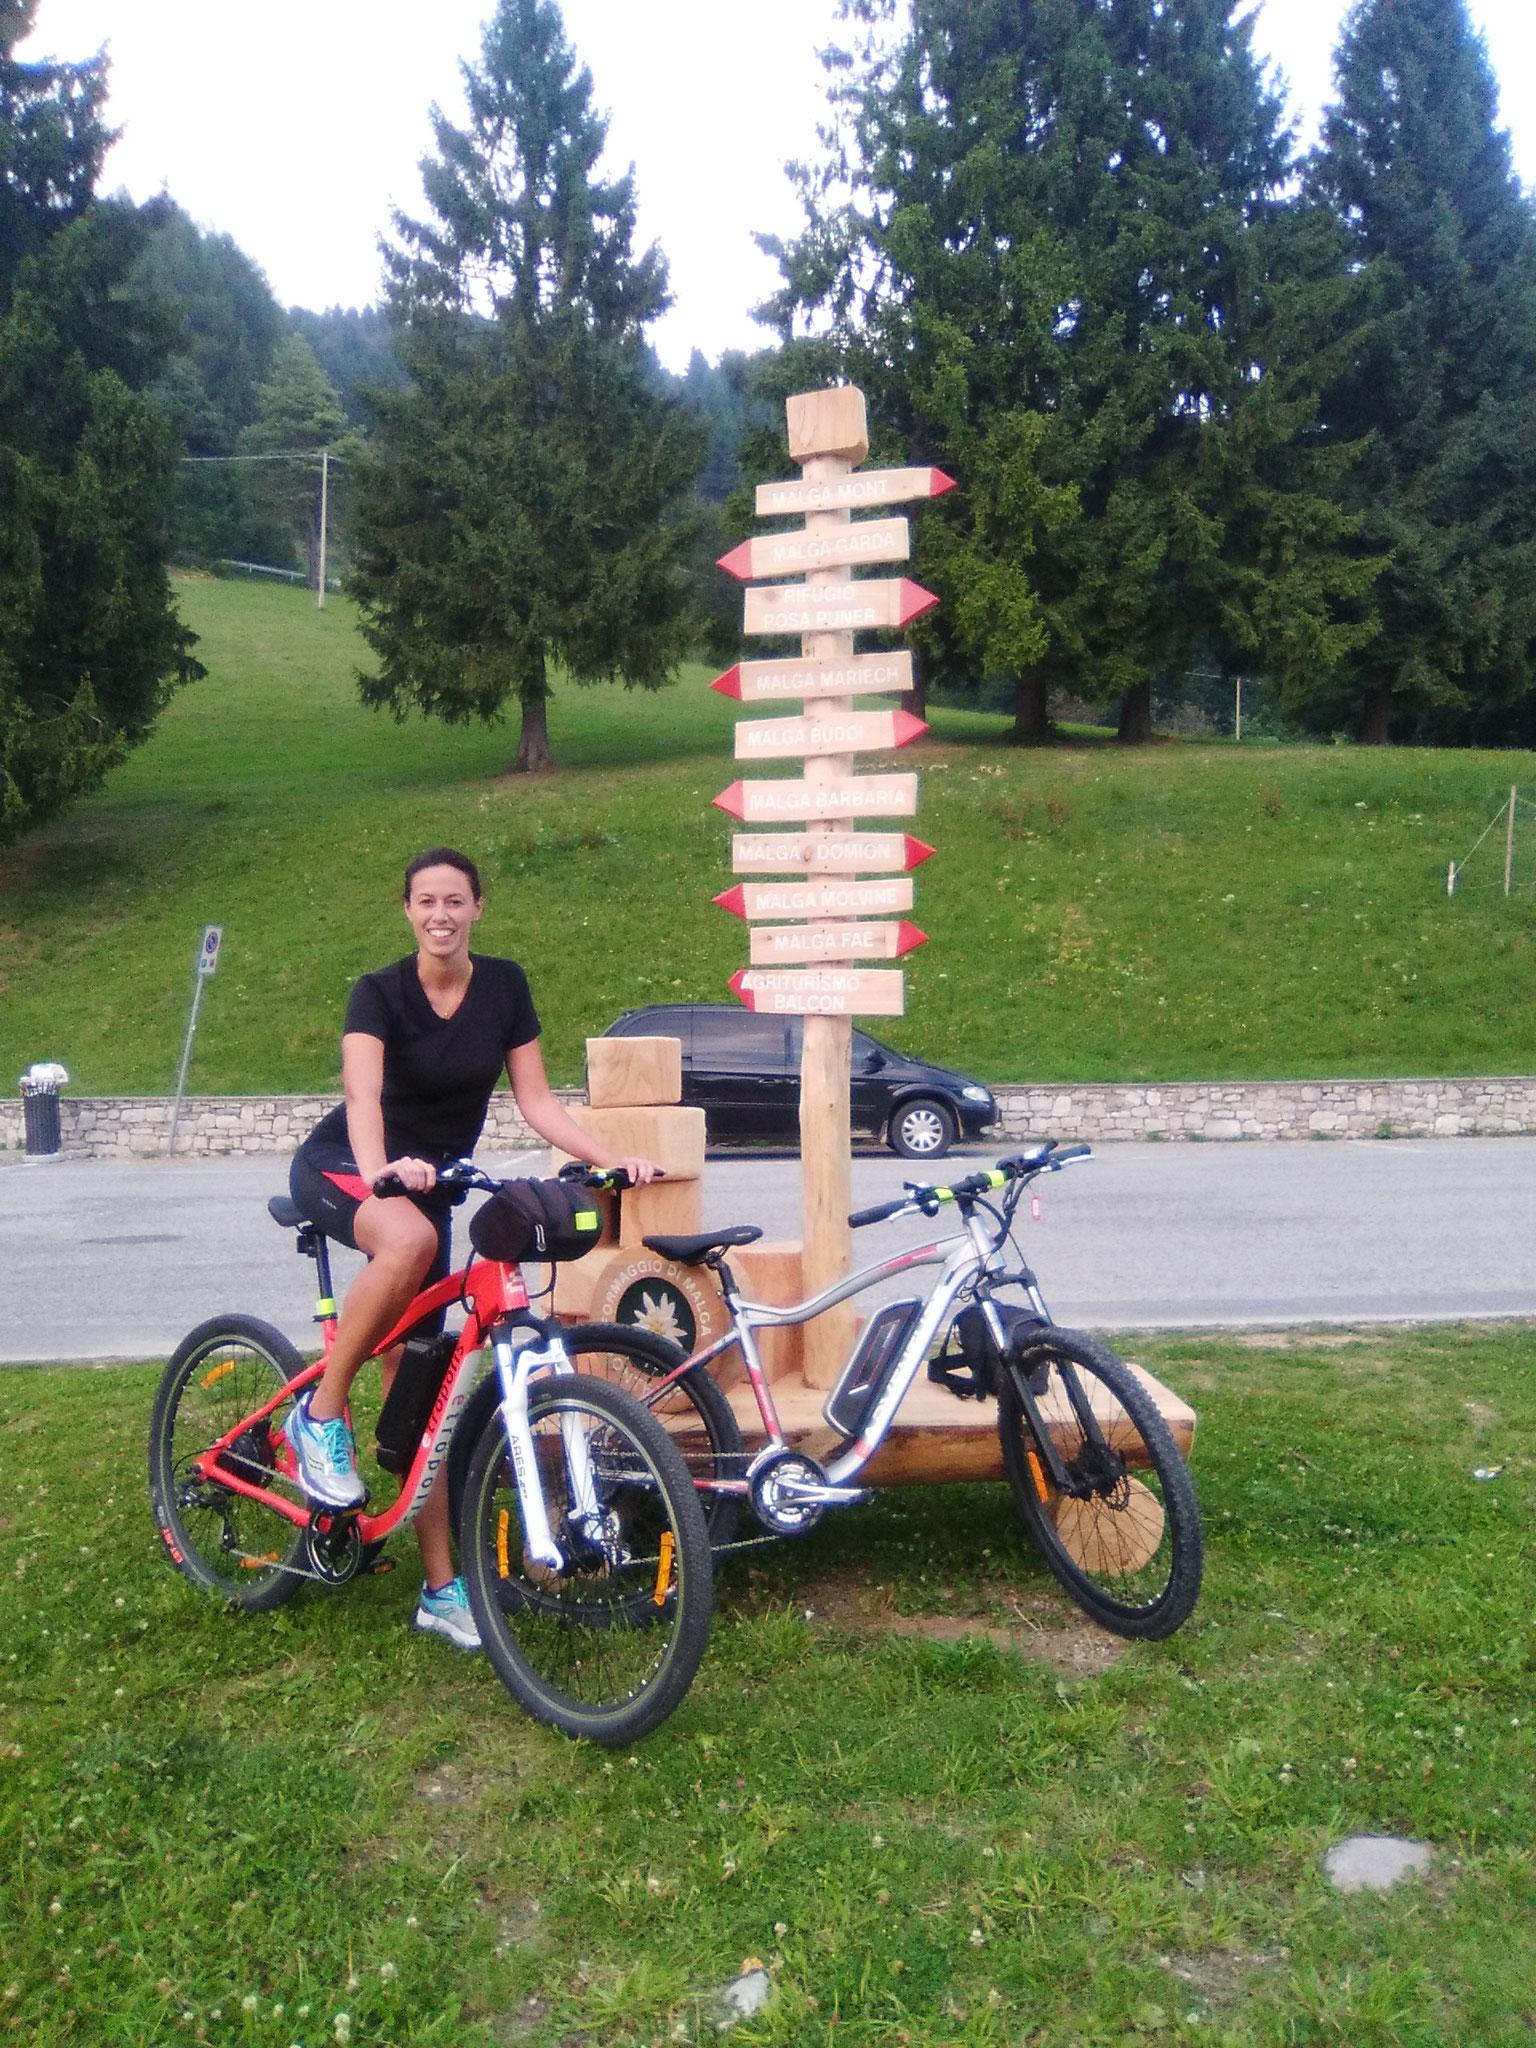 Punto Service, Pianezze di Valdobbiadene in e-bike